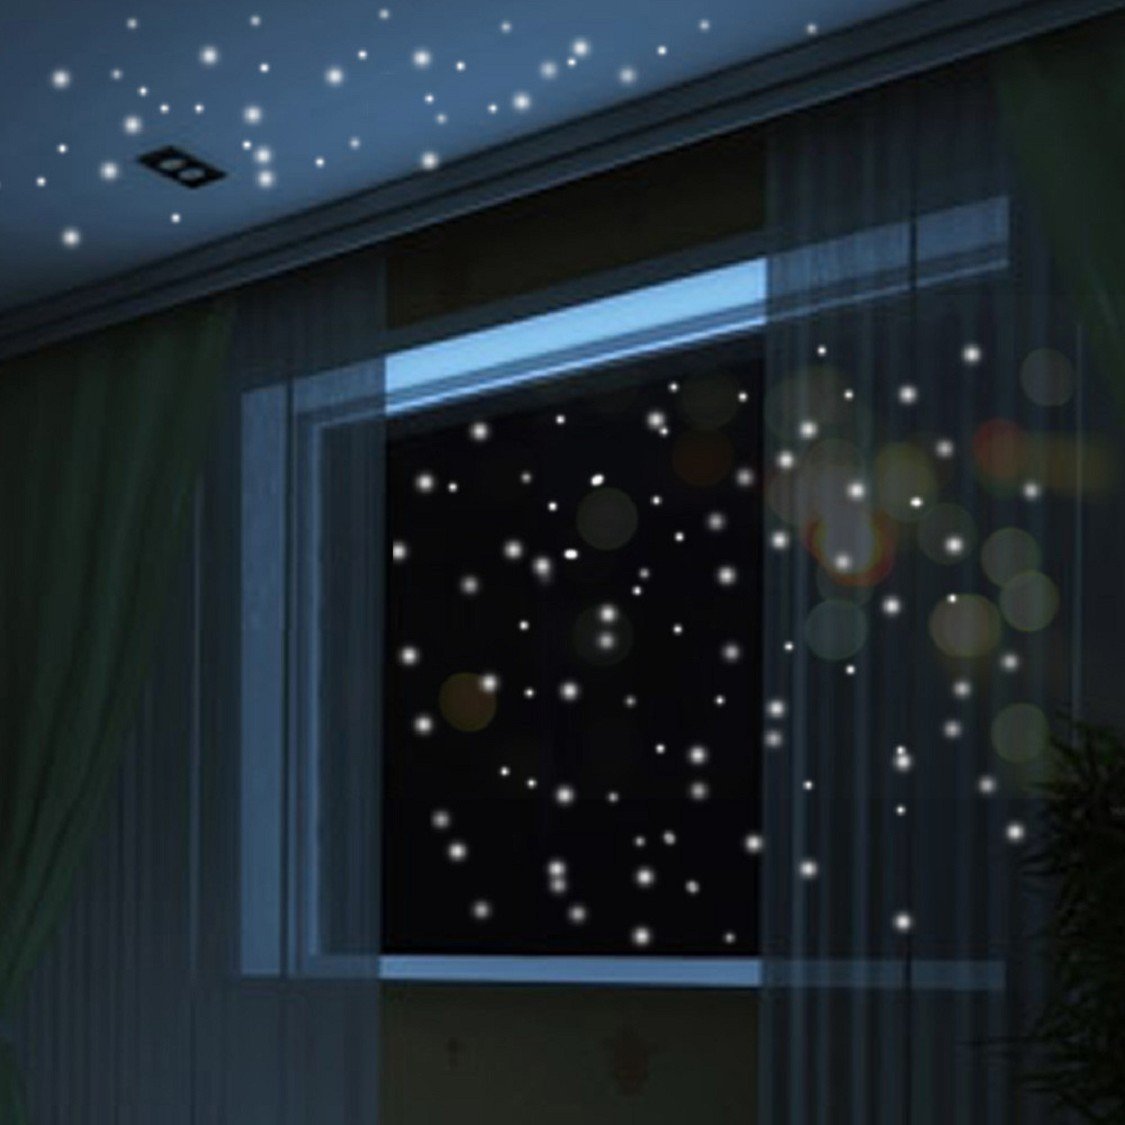 Naladoo low In The Dark Star Wall Stickers 407Pcs Luminous Dots Wall Stickers Kids Room Decor Wall Stickers